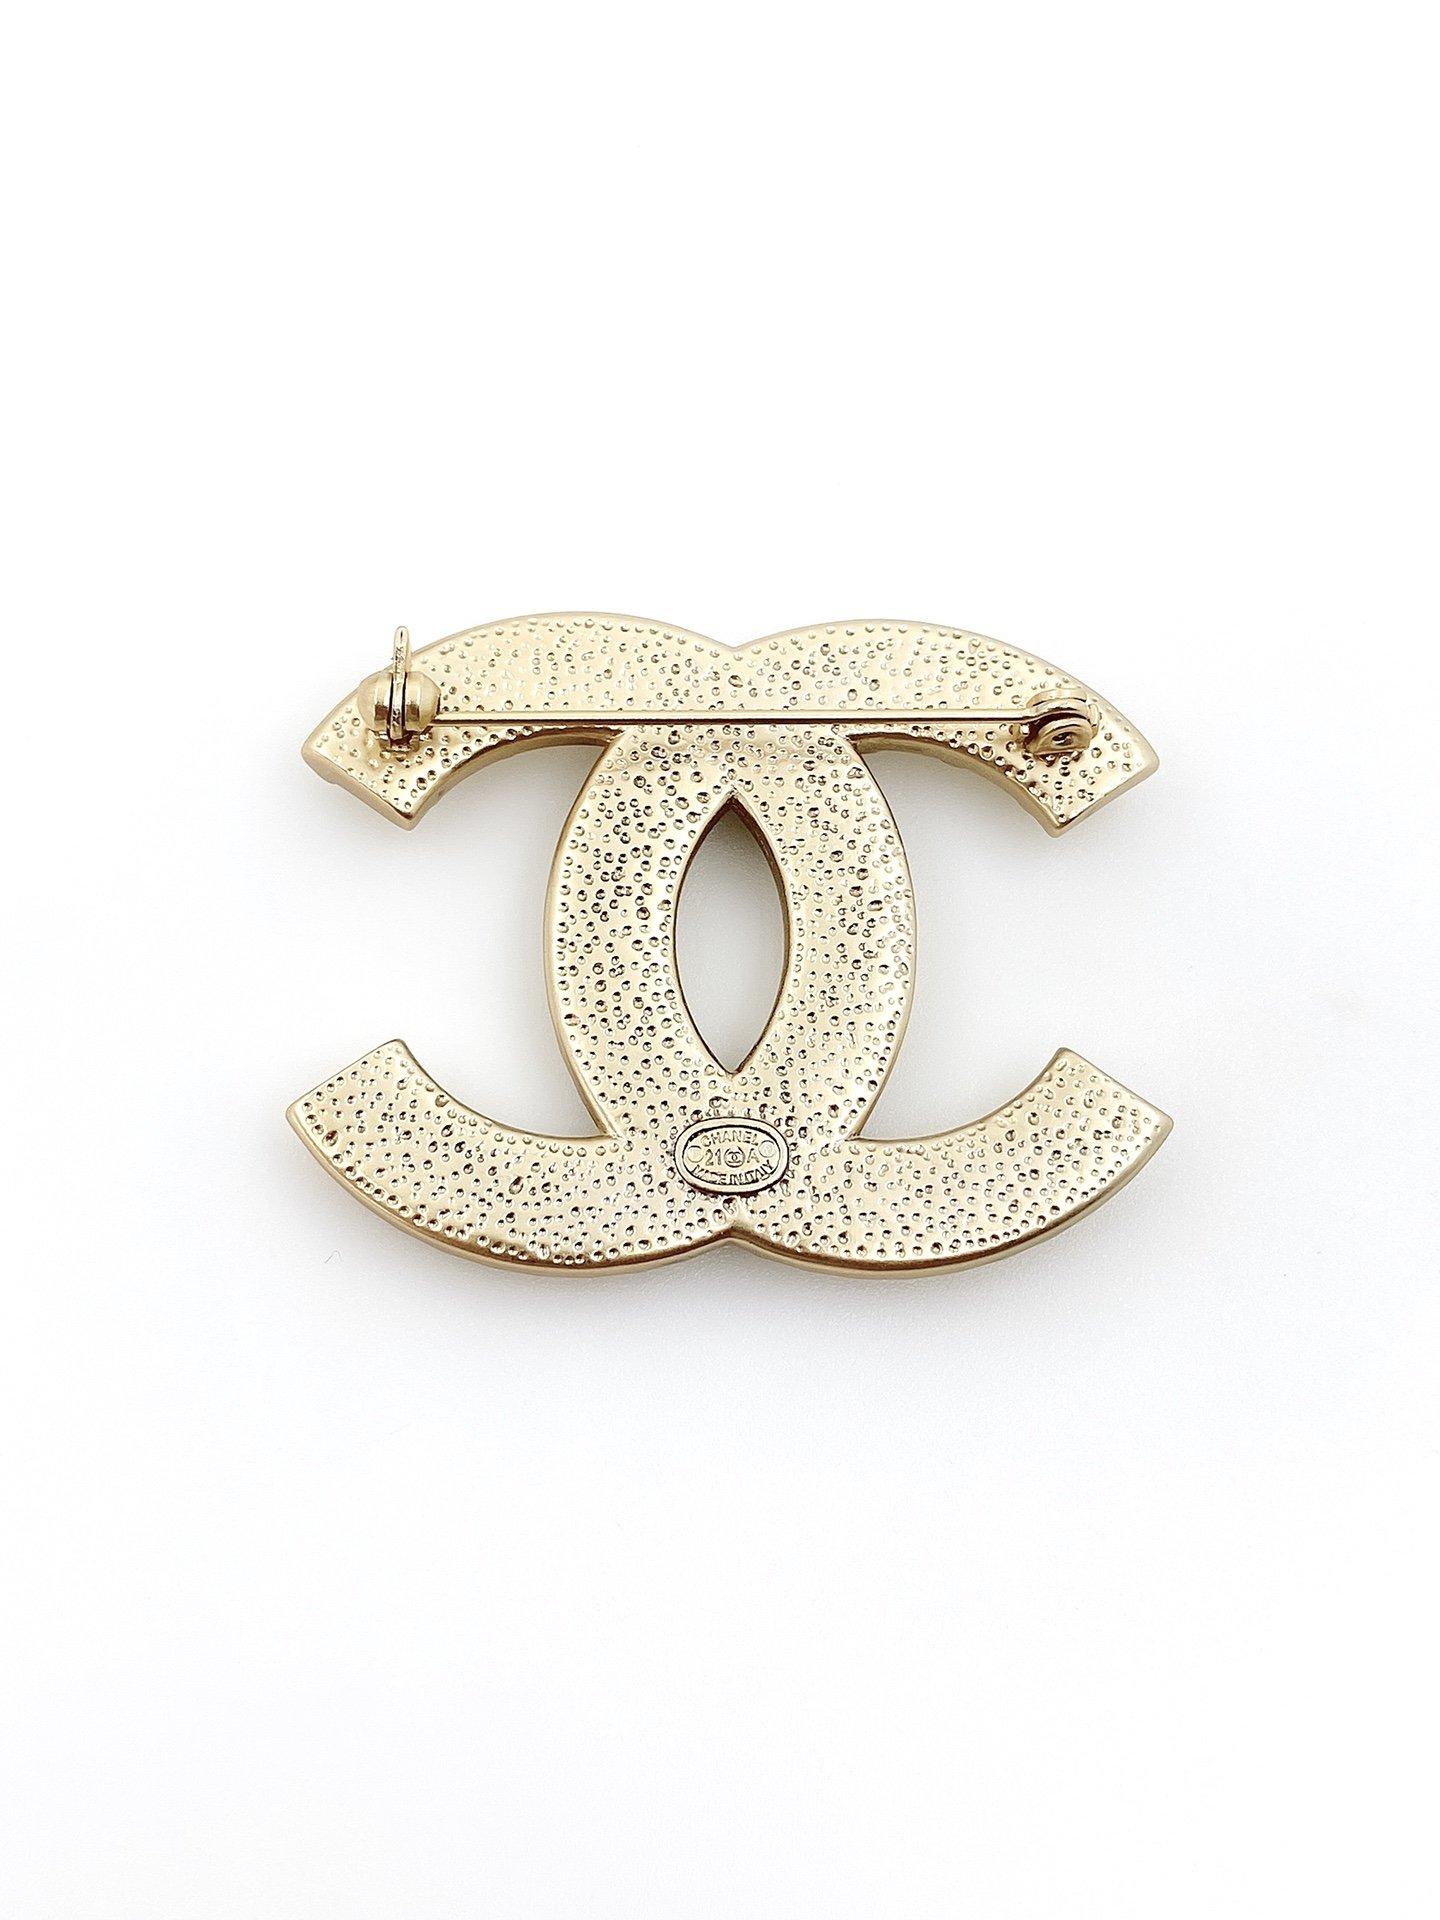 CHANEL小香珍珠排钻双c胸针高端